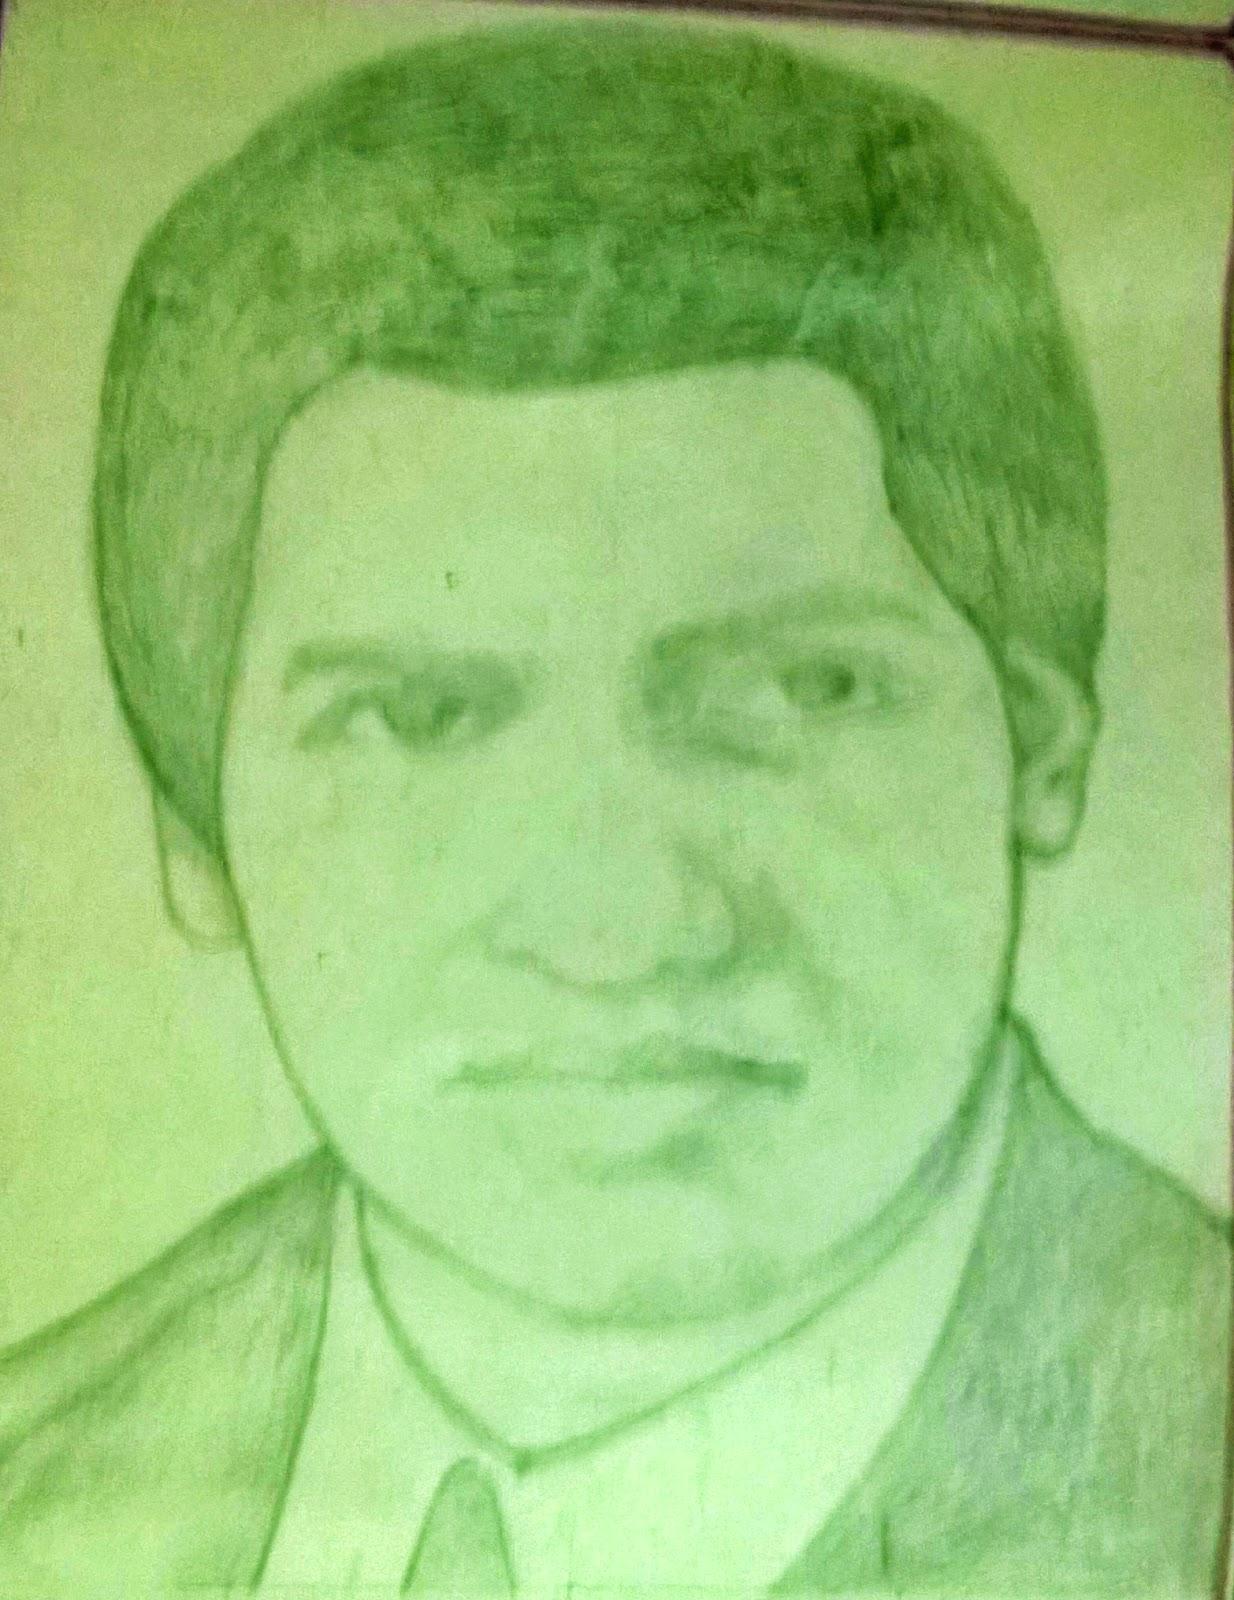 Manus sketches portraits